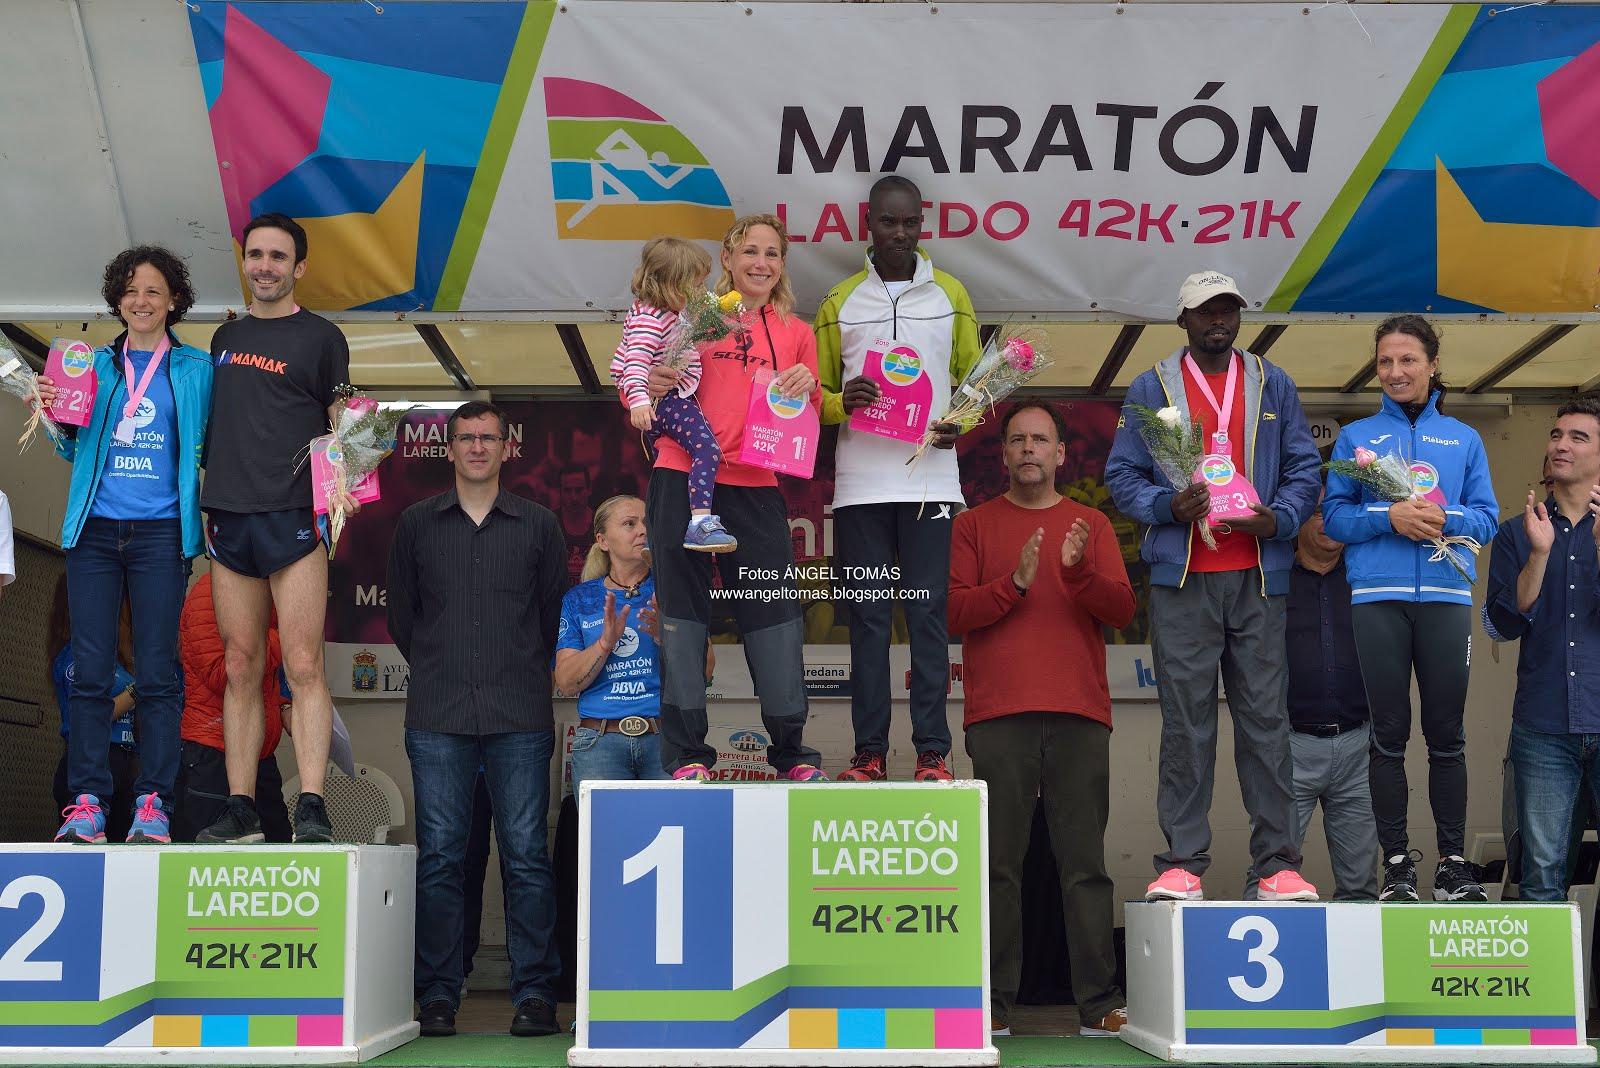 Maraton Laredo FOTO ANGEL TOMAS _AT56492